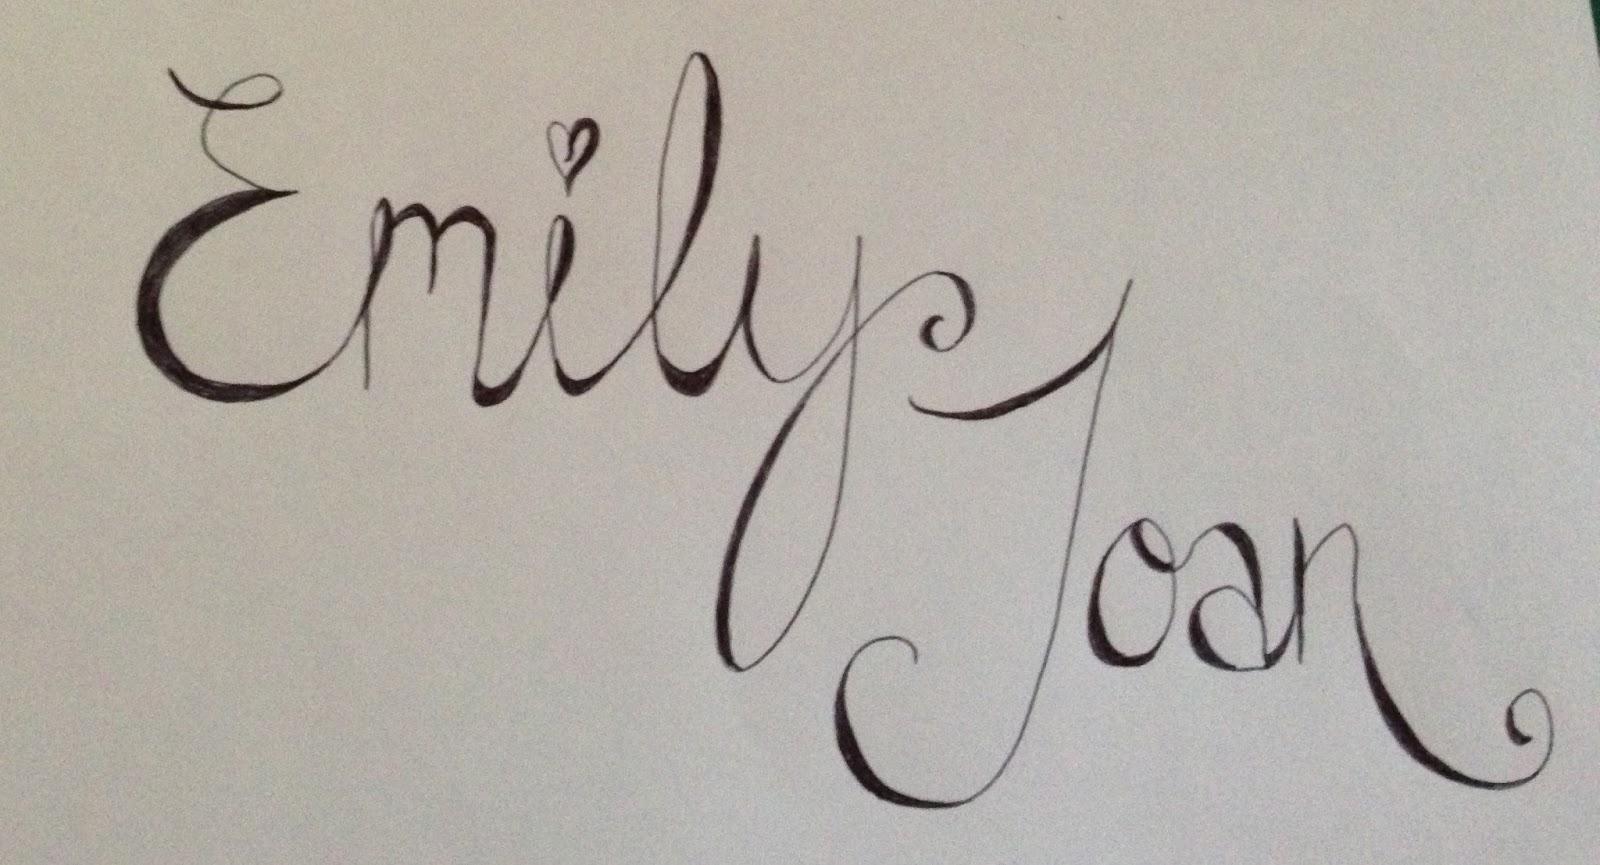 Emily Joan Fake Calligraphy Pinterest Wednesday